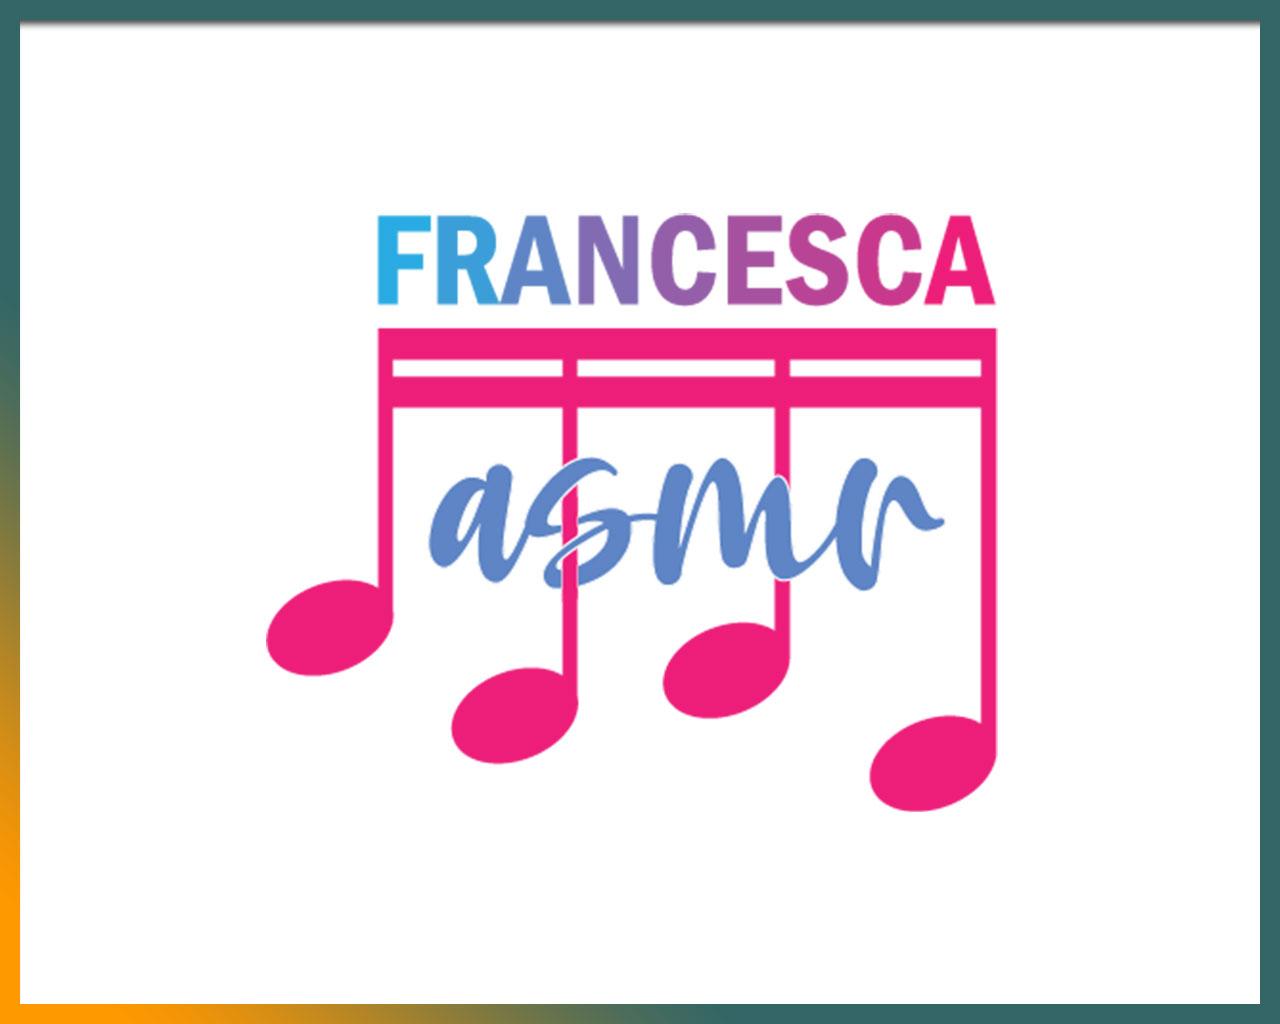 Logo Francesca ASMR